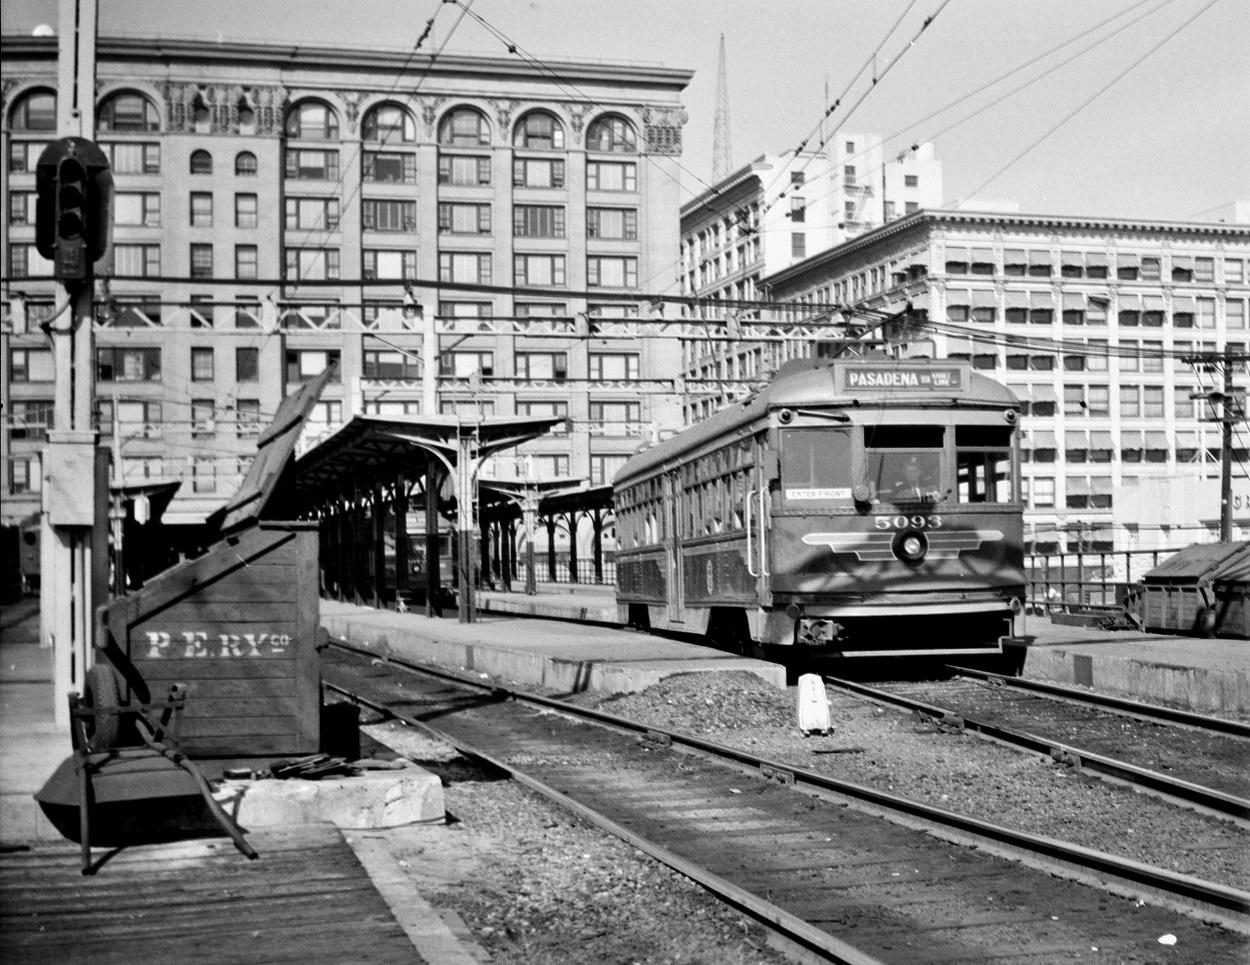 PE 5093 Pasadena Short Line, Main Street Station, May 4, 1950